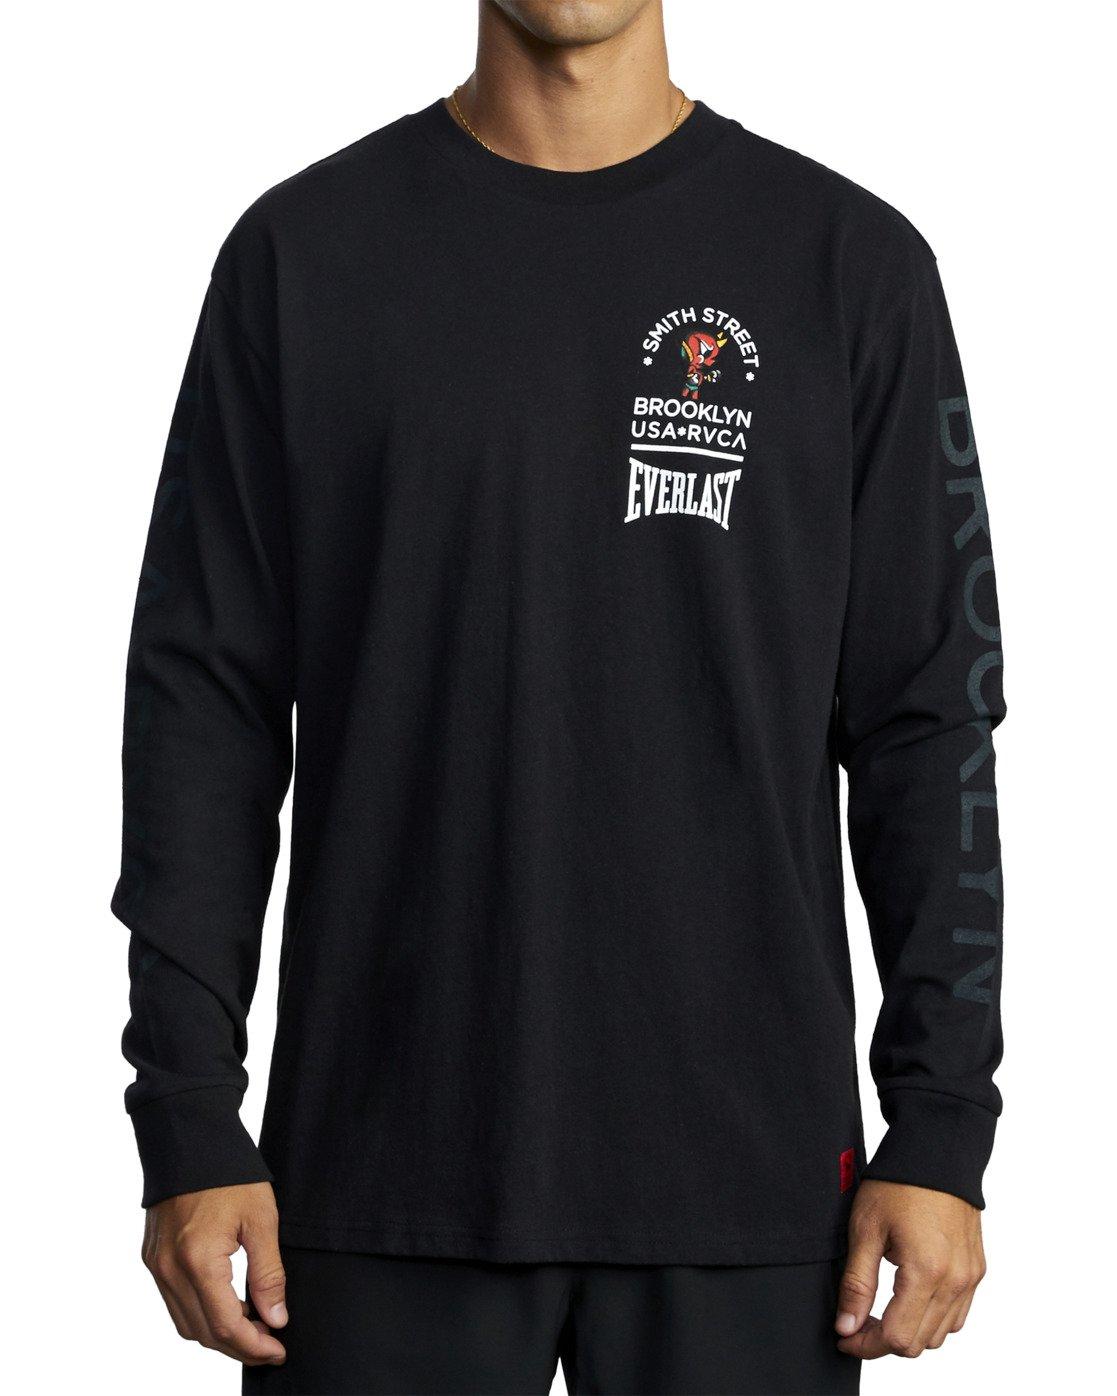 8 Everlast x Smith Street Big Angel - Long Sleeve T-Shirt for Men Black U4LSECRVF0 RVCA